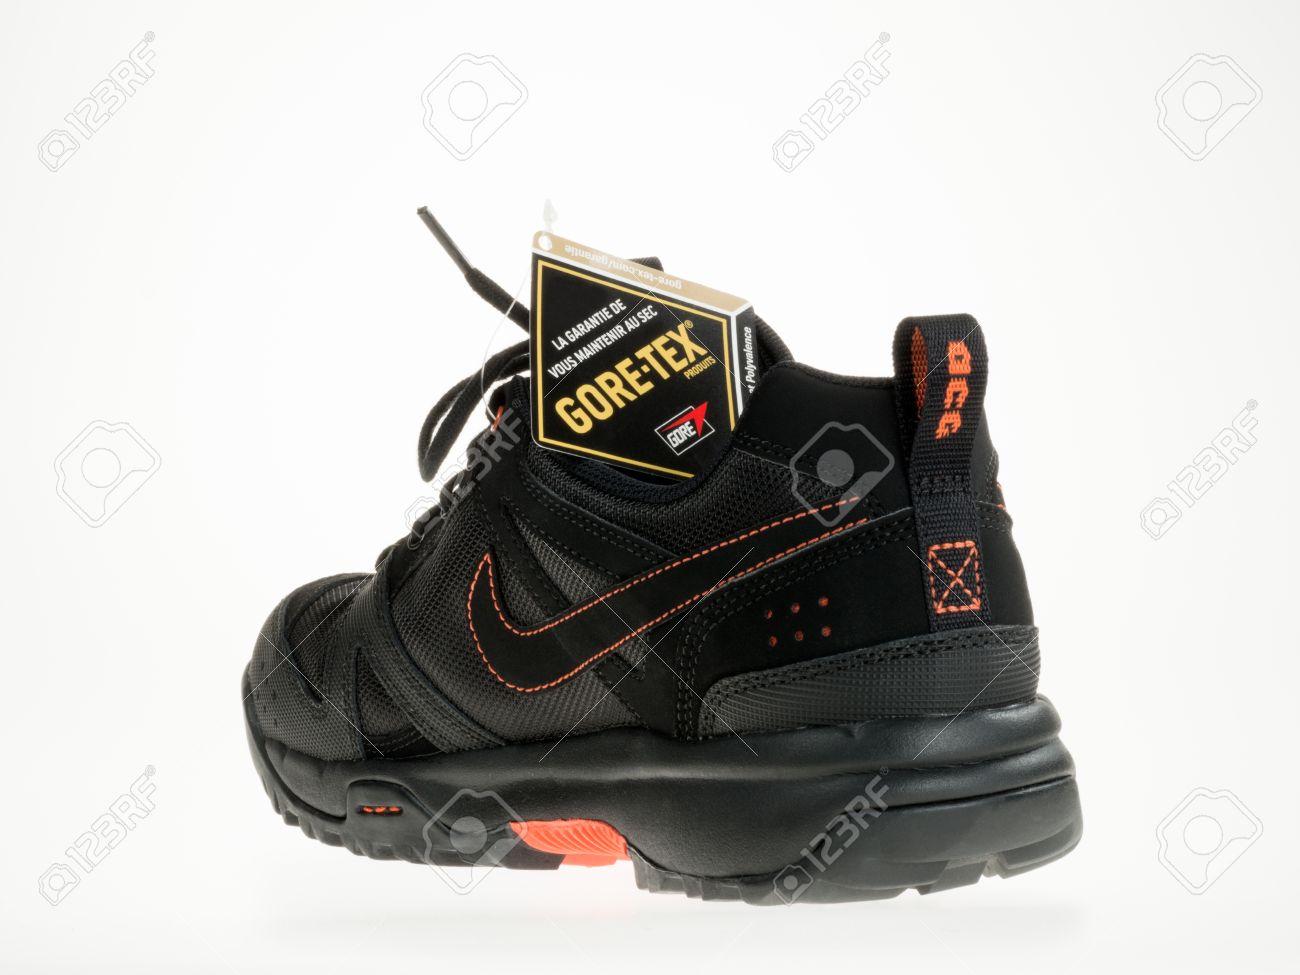 chaussures randonnée nike